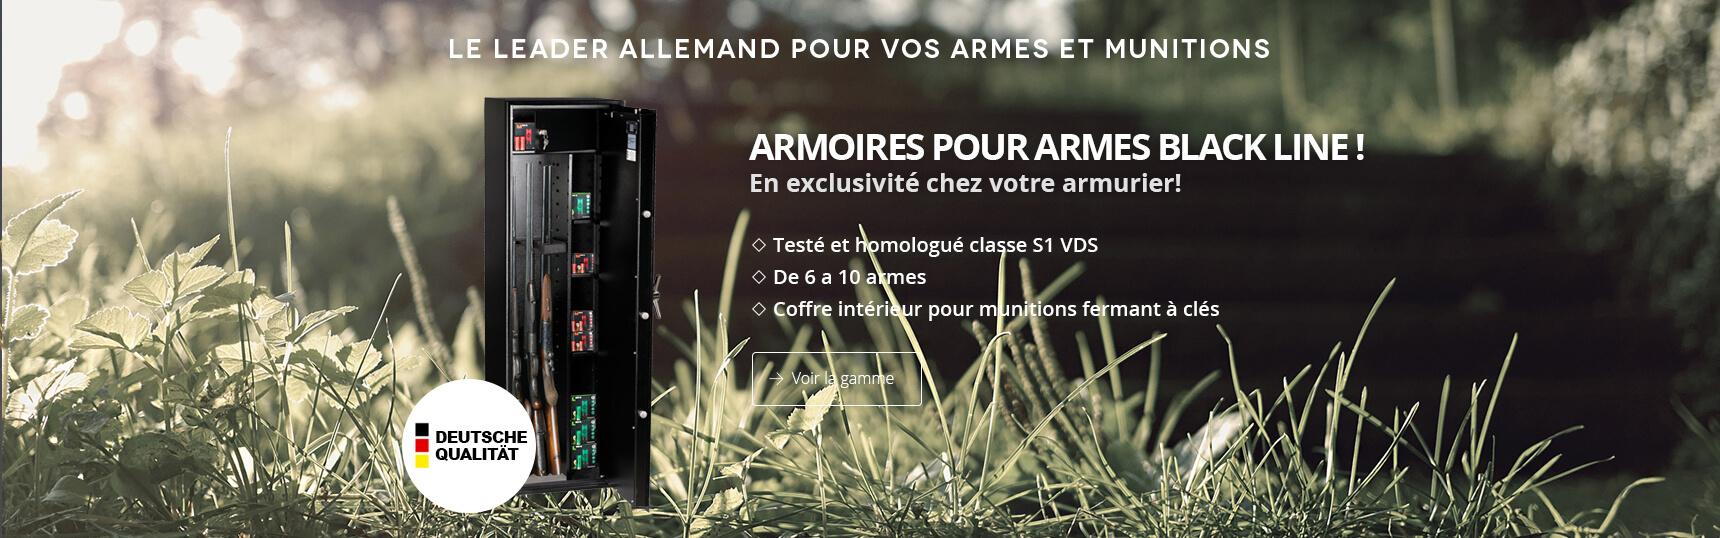 Armoire Armes Blackline